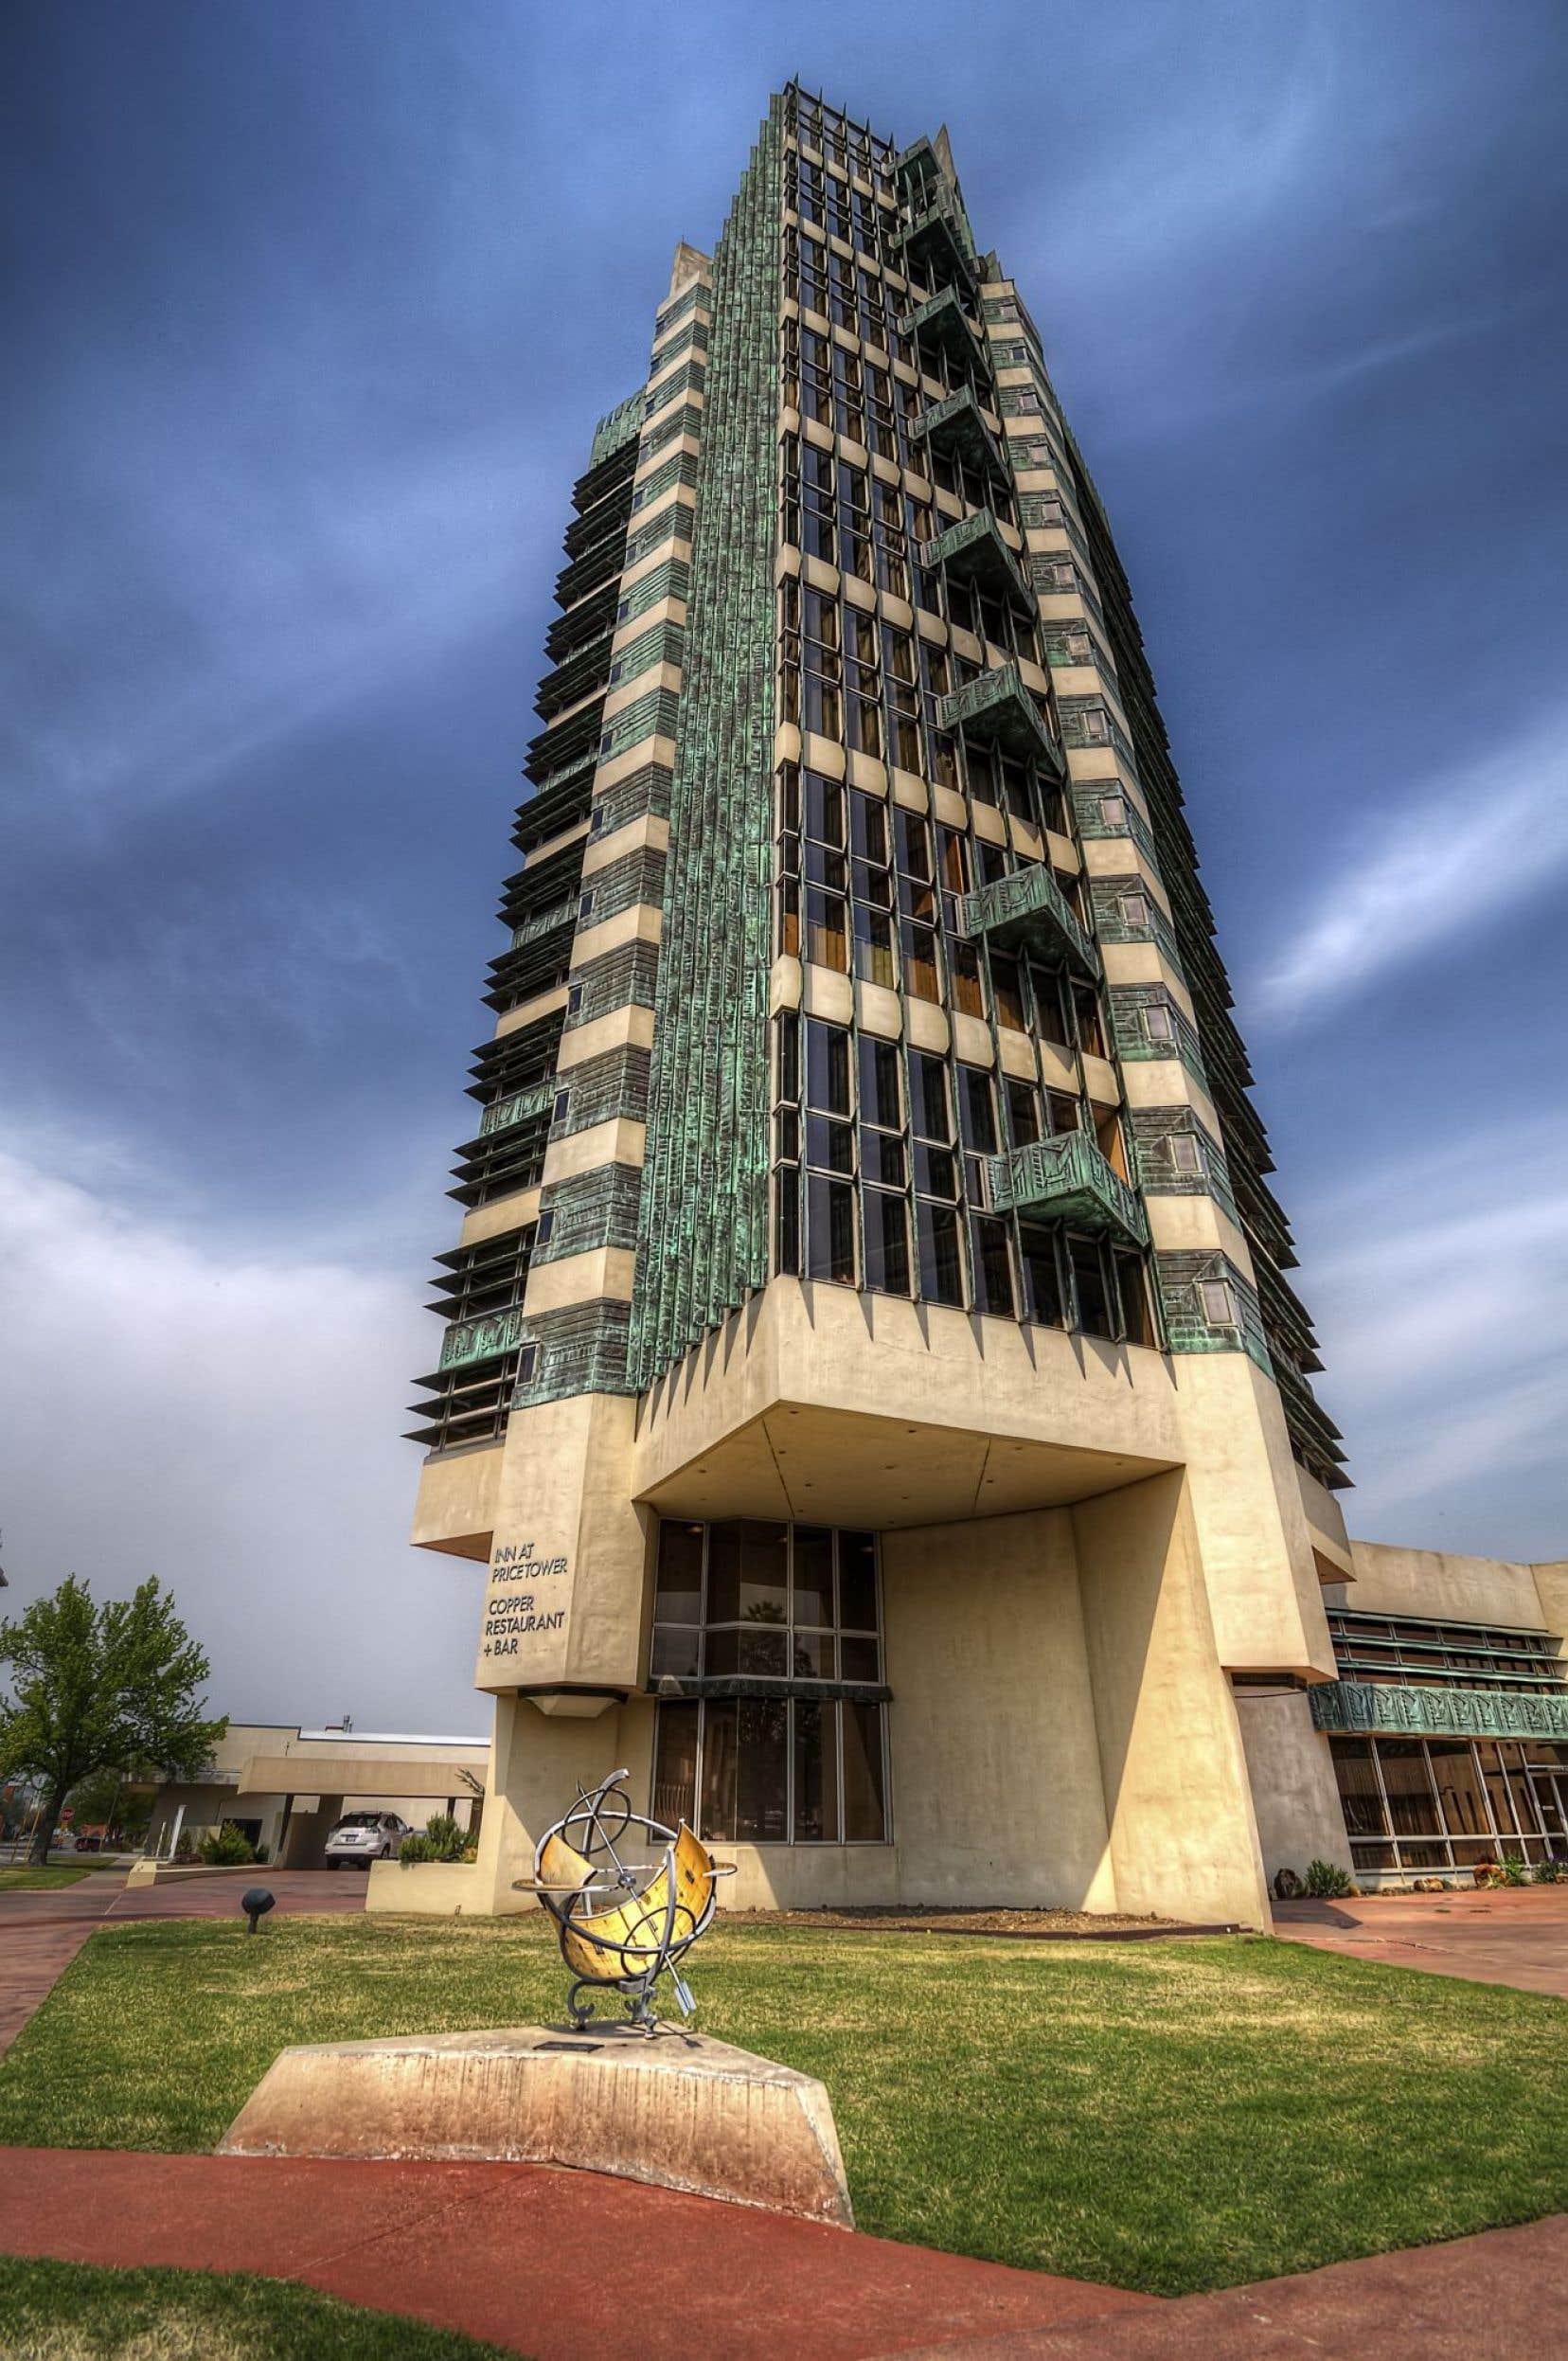 Price Tower, Bartlesville, Oklahoma